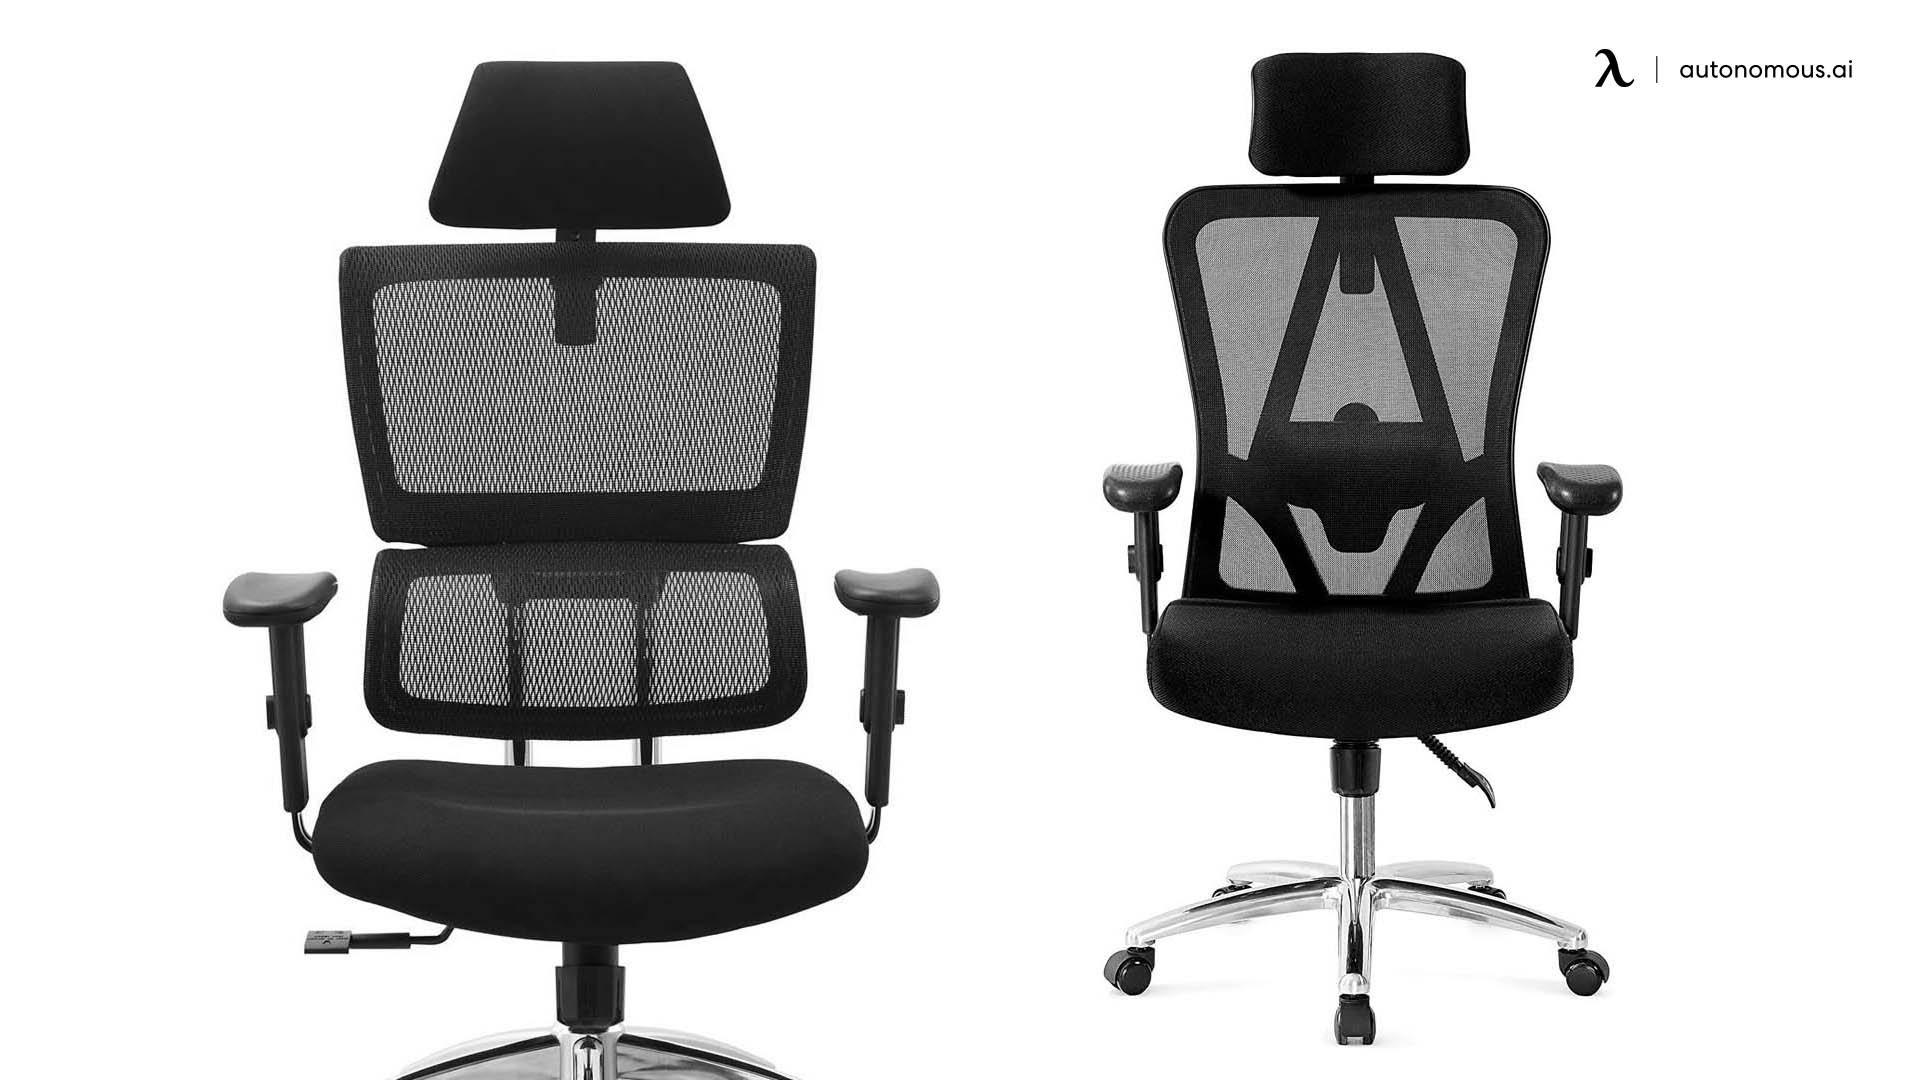 Tivoca Black Ergonomic chair headrest